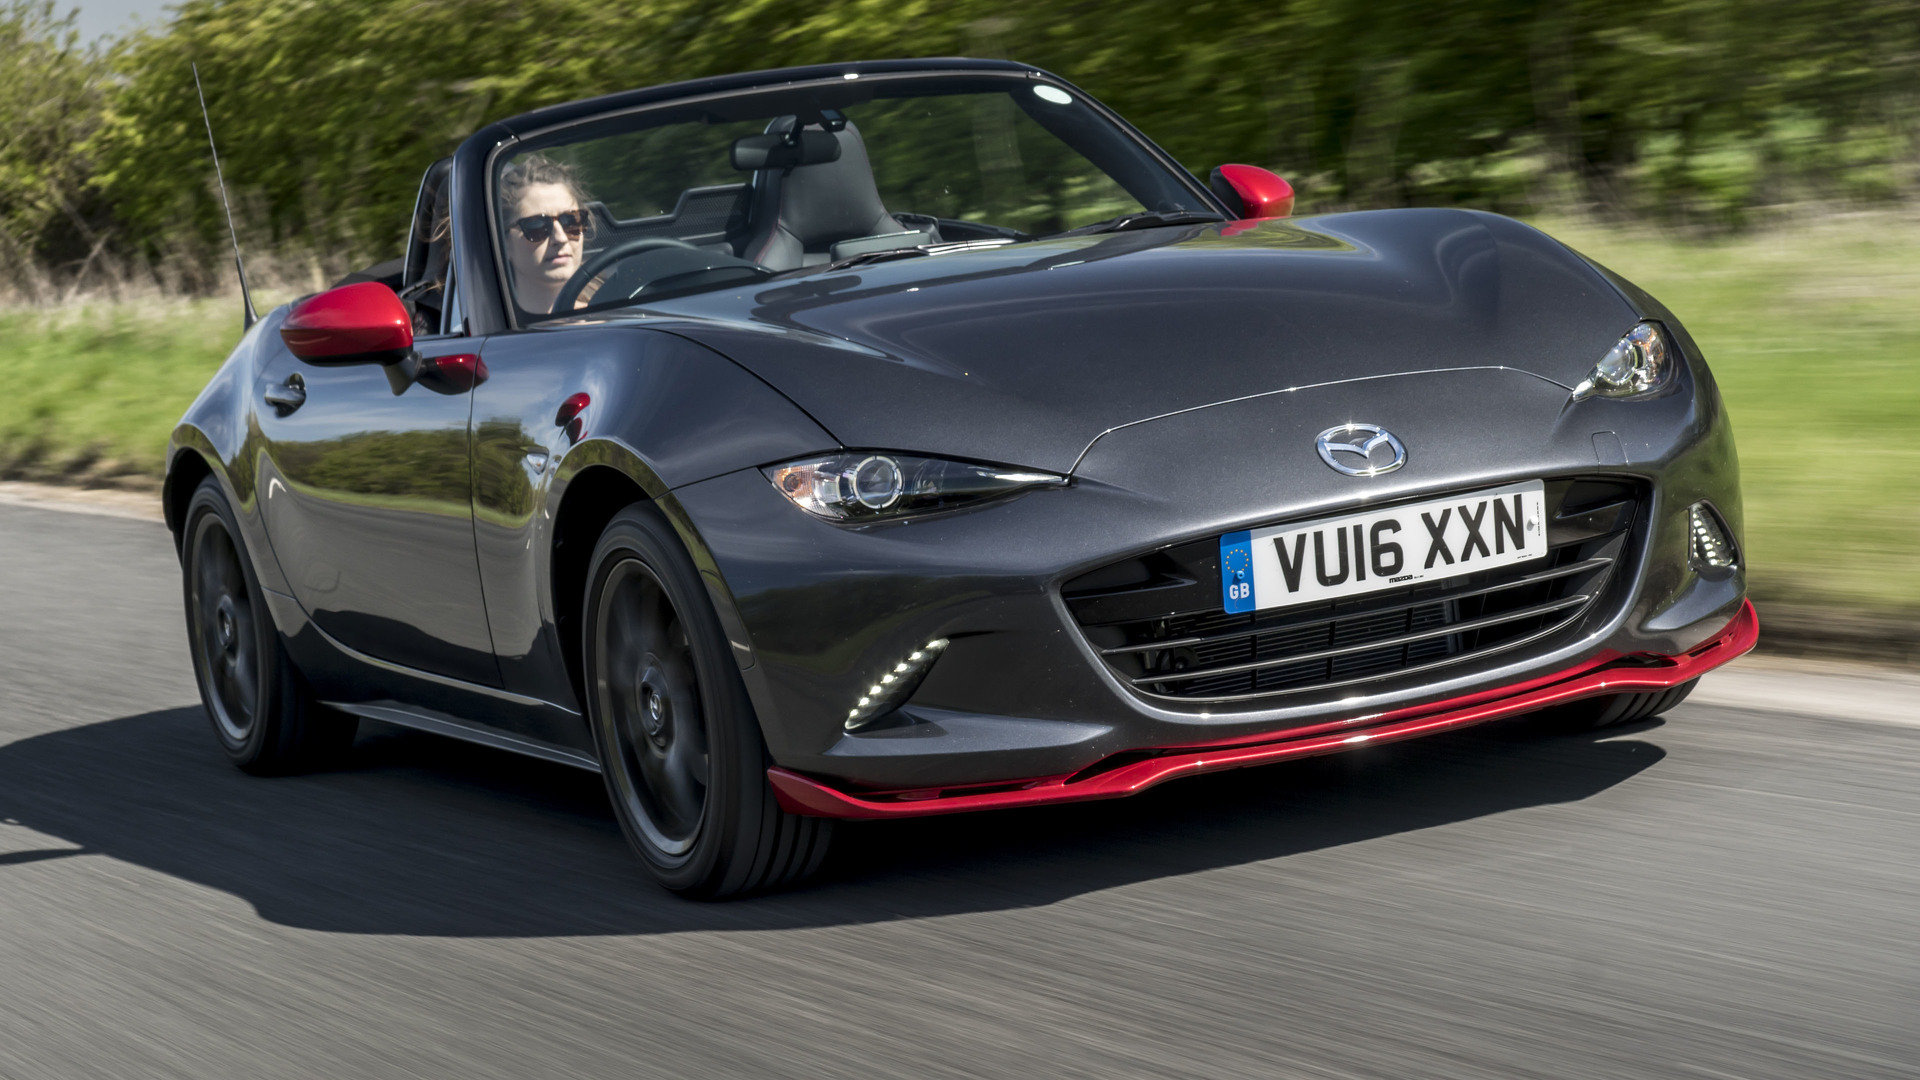 Mazda Miata Icon edition celebrates its status at Goodwood